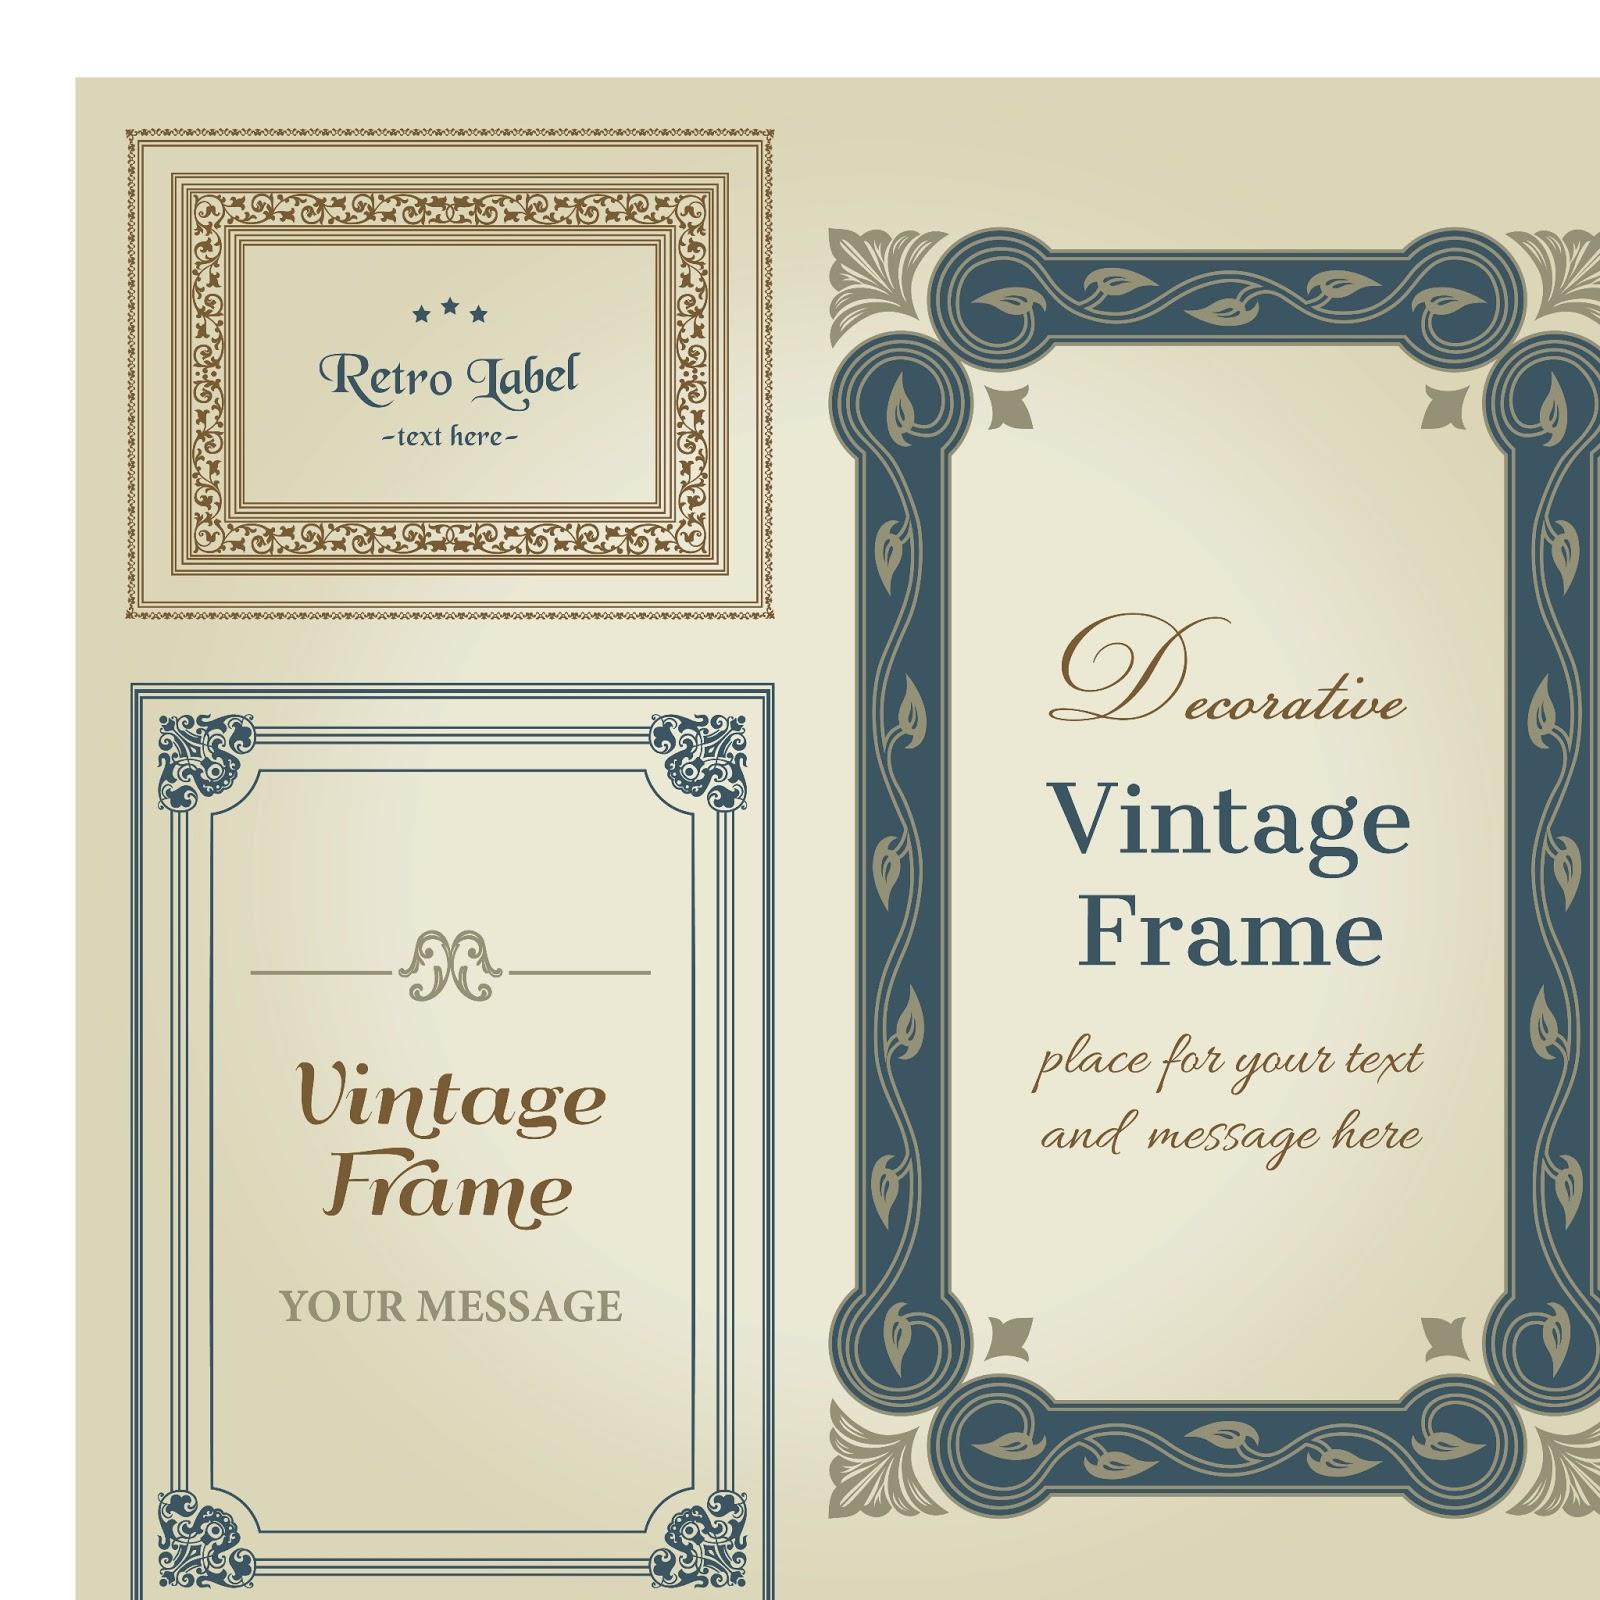 1600x1600 Decorative Vintage Wedding Frame Vector Wedding Card Background